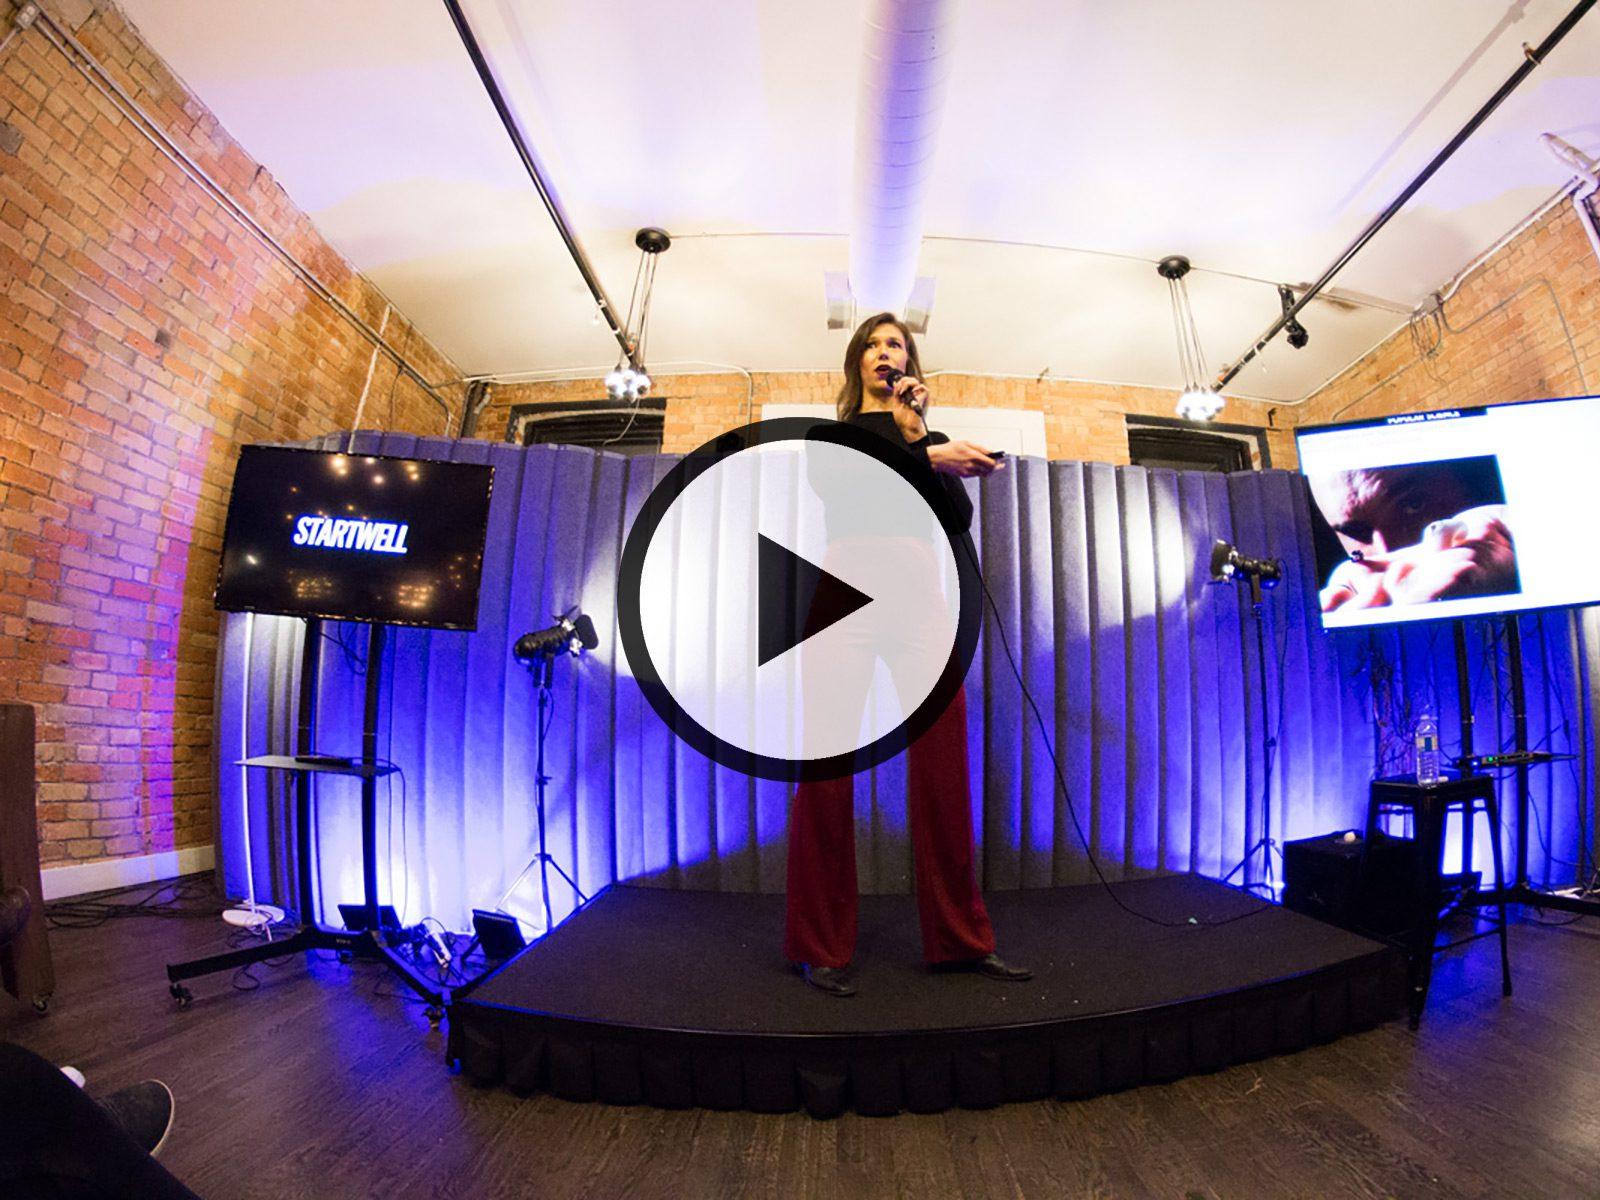 Oksana Andreiuk at Dark Futures YYZ 2019 (at StartWell)